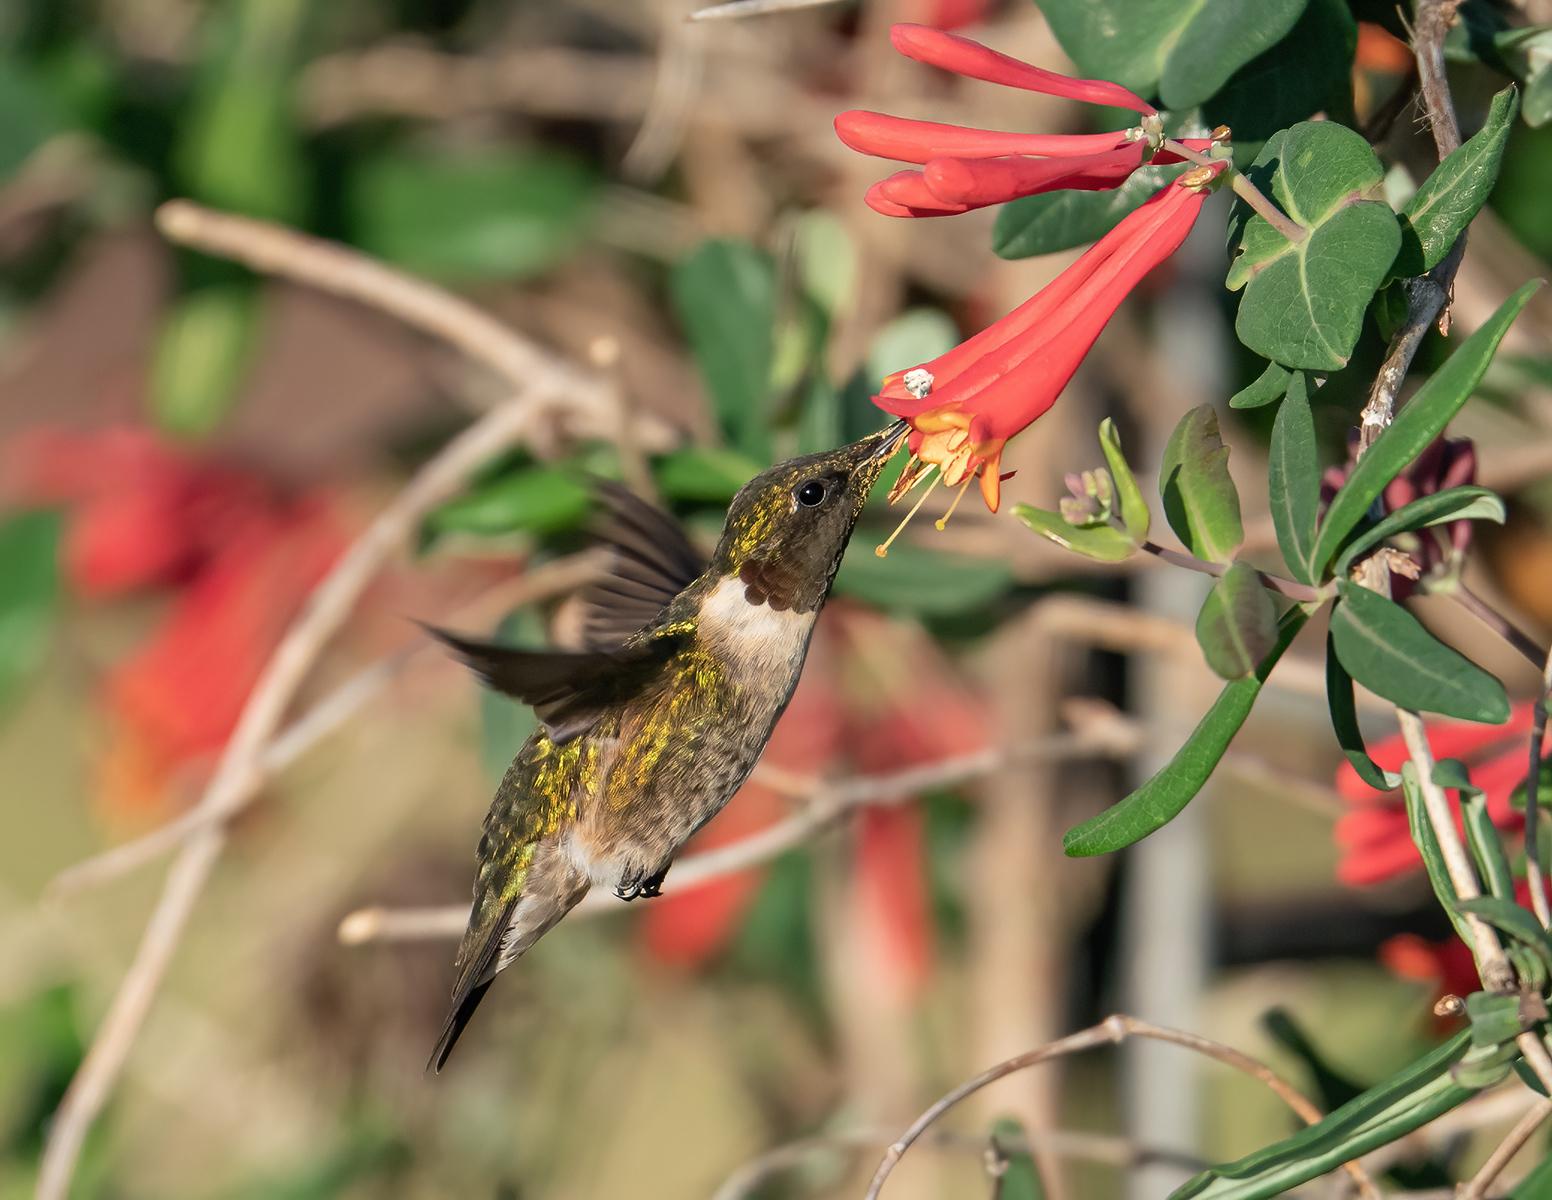 IMAGE: https://photos.smugmug.com/Beautyinthetreesandintheair/Hummingbirds-2021/i-NkWmhWg/0/0ff51acb/X3/RT%20Hummingbird_9_3-29-21-87-X3.jpg